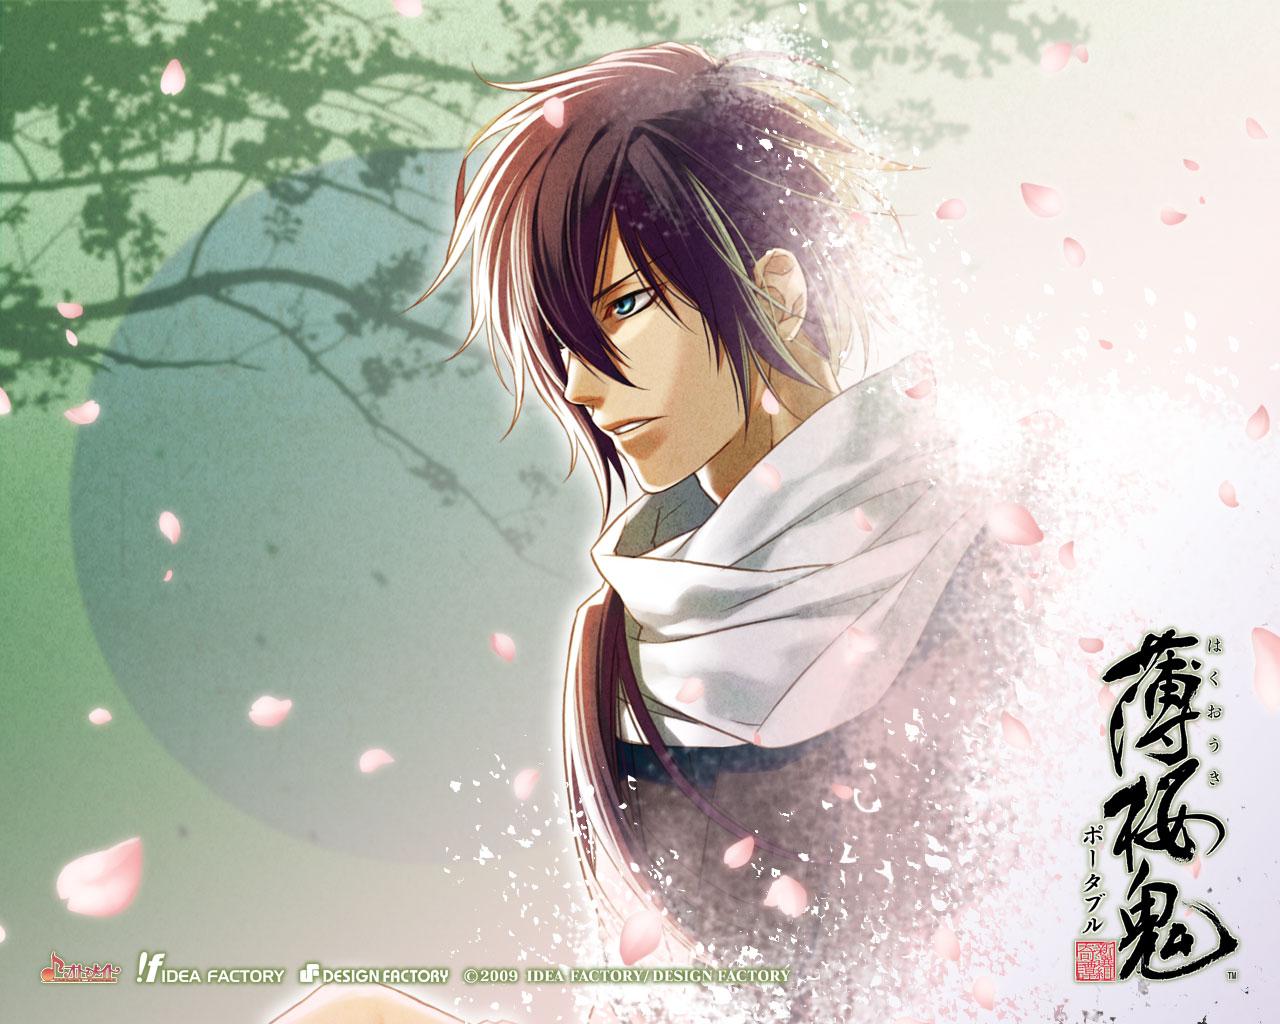 http://1.bp.blogspot.com/_jV241FFac4E/TTpHbJOxVhI/AAAAAAAAAvg/V14g3YXxmIM/s1600/hakuouki_saitou_hajime_wallpaper2_1280x1024.jpg